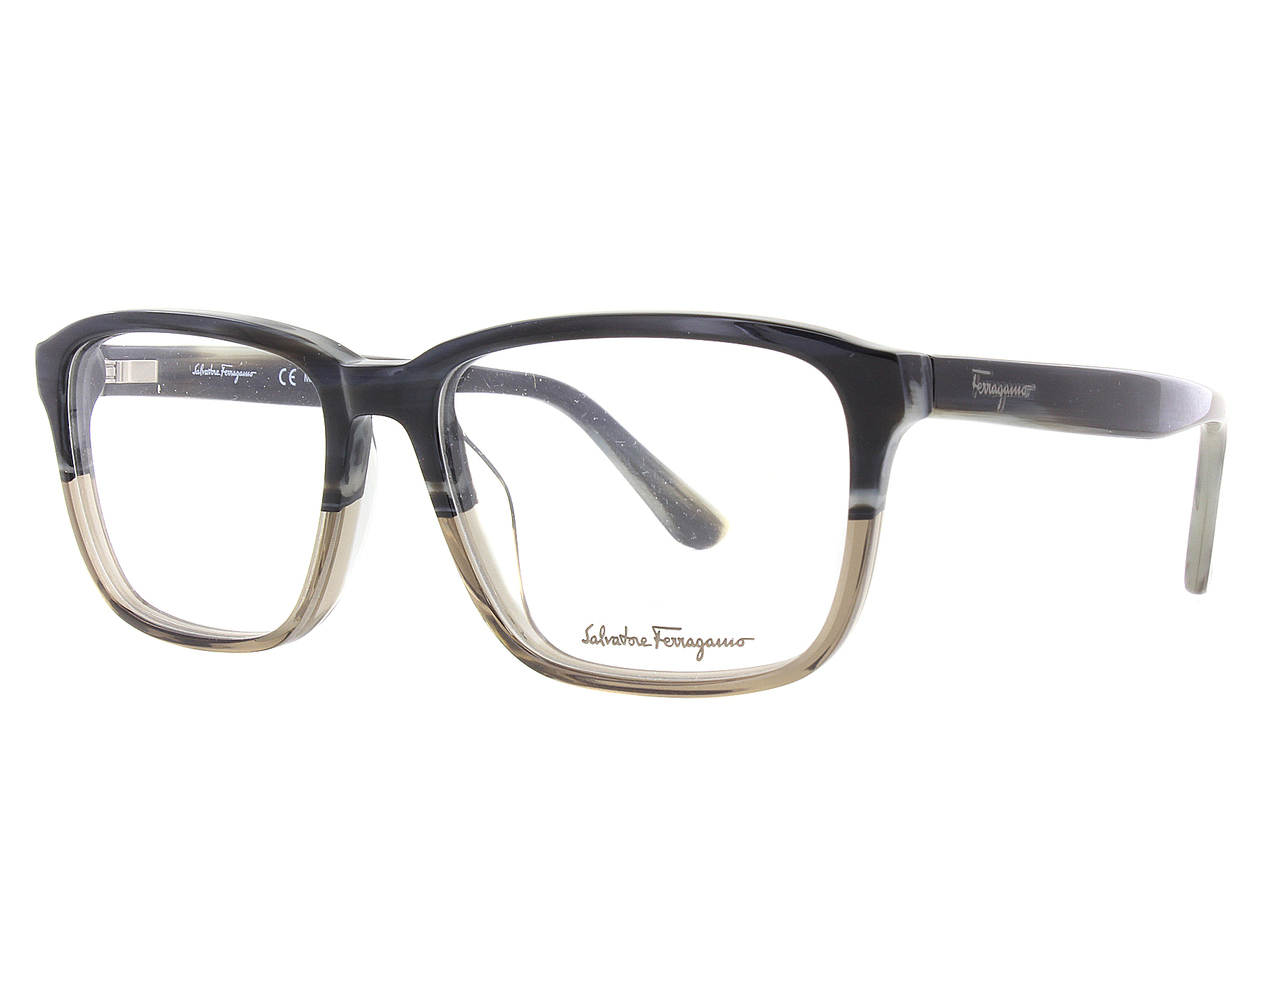 25e7ccebb7 Details about NEW Salvatore Ferragamo SF2738-466-5416 Blue Grey 54mm  Eyeglasses